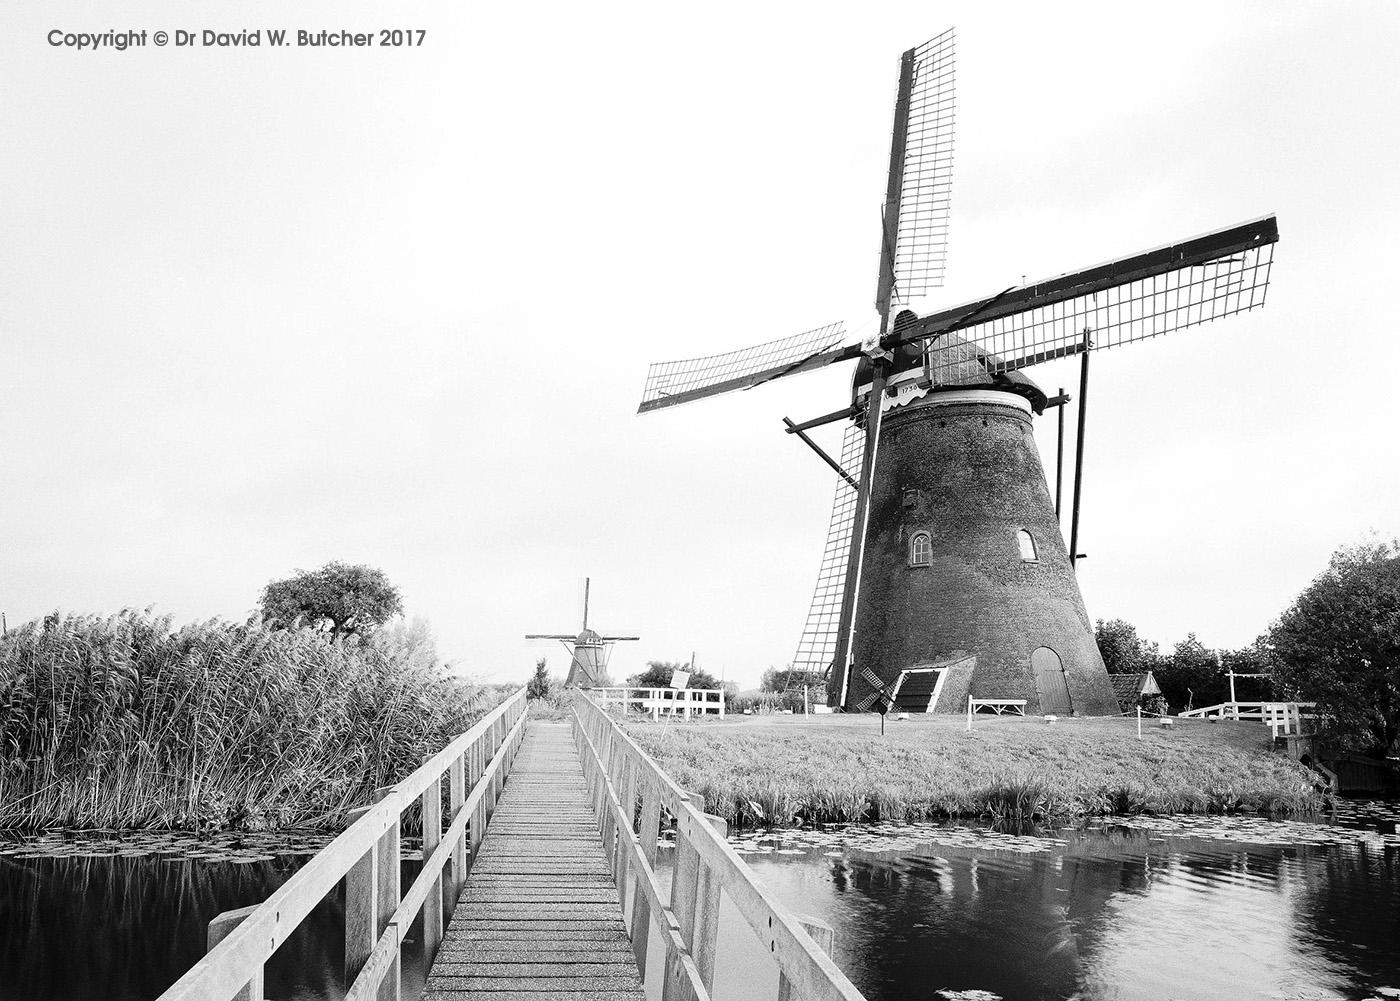 Kinderdijk Windmills and Bridge, Rotterdam, Netherlands